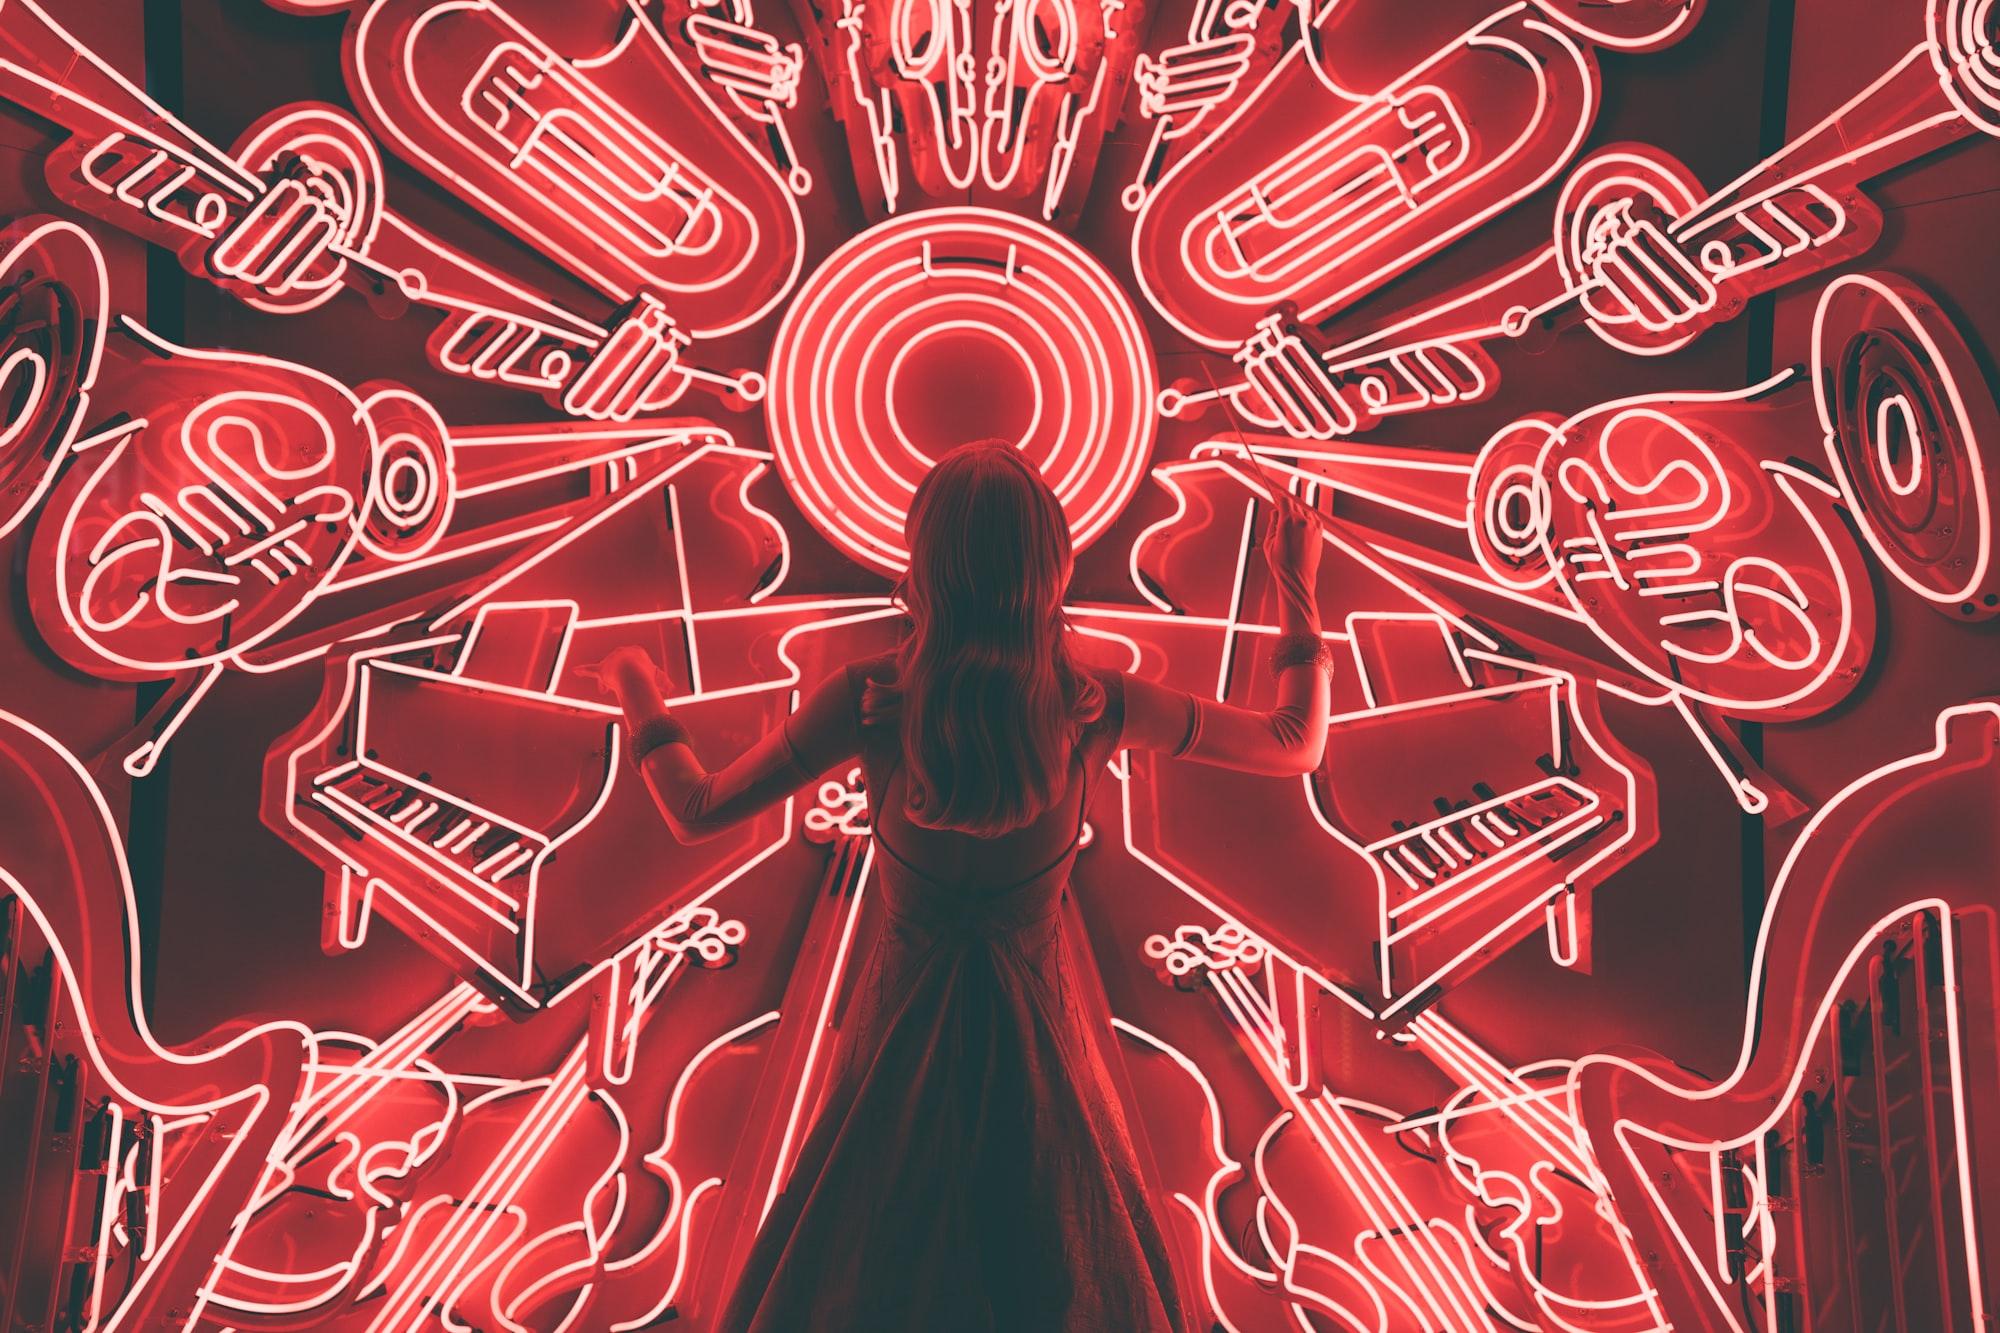 Should musicians fear technological innovation?